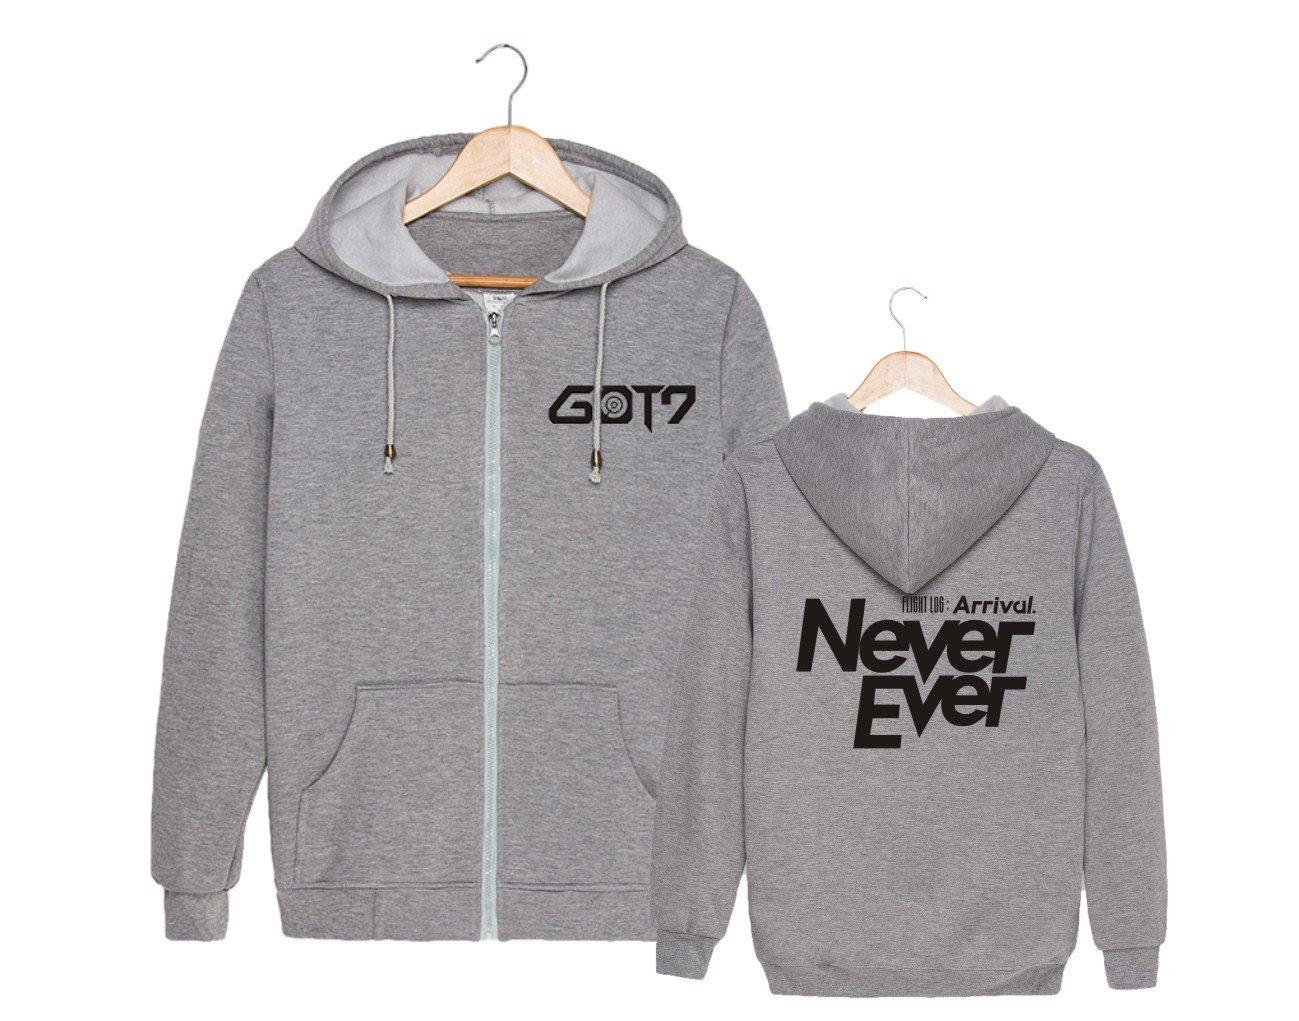 ALLDECOR Kpop GOT7 Never Ever Cotton Pullover Coat Unisex Zipper Hoodie Sweater